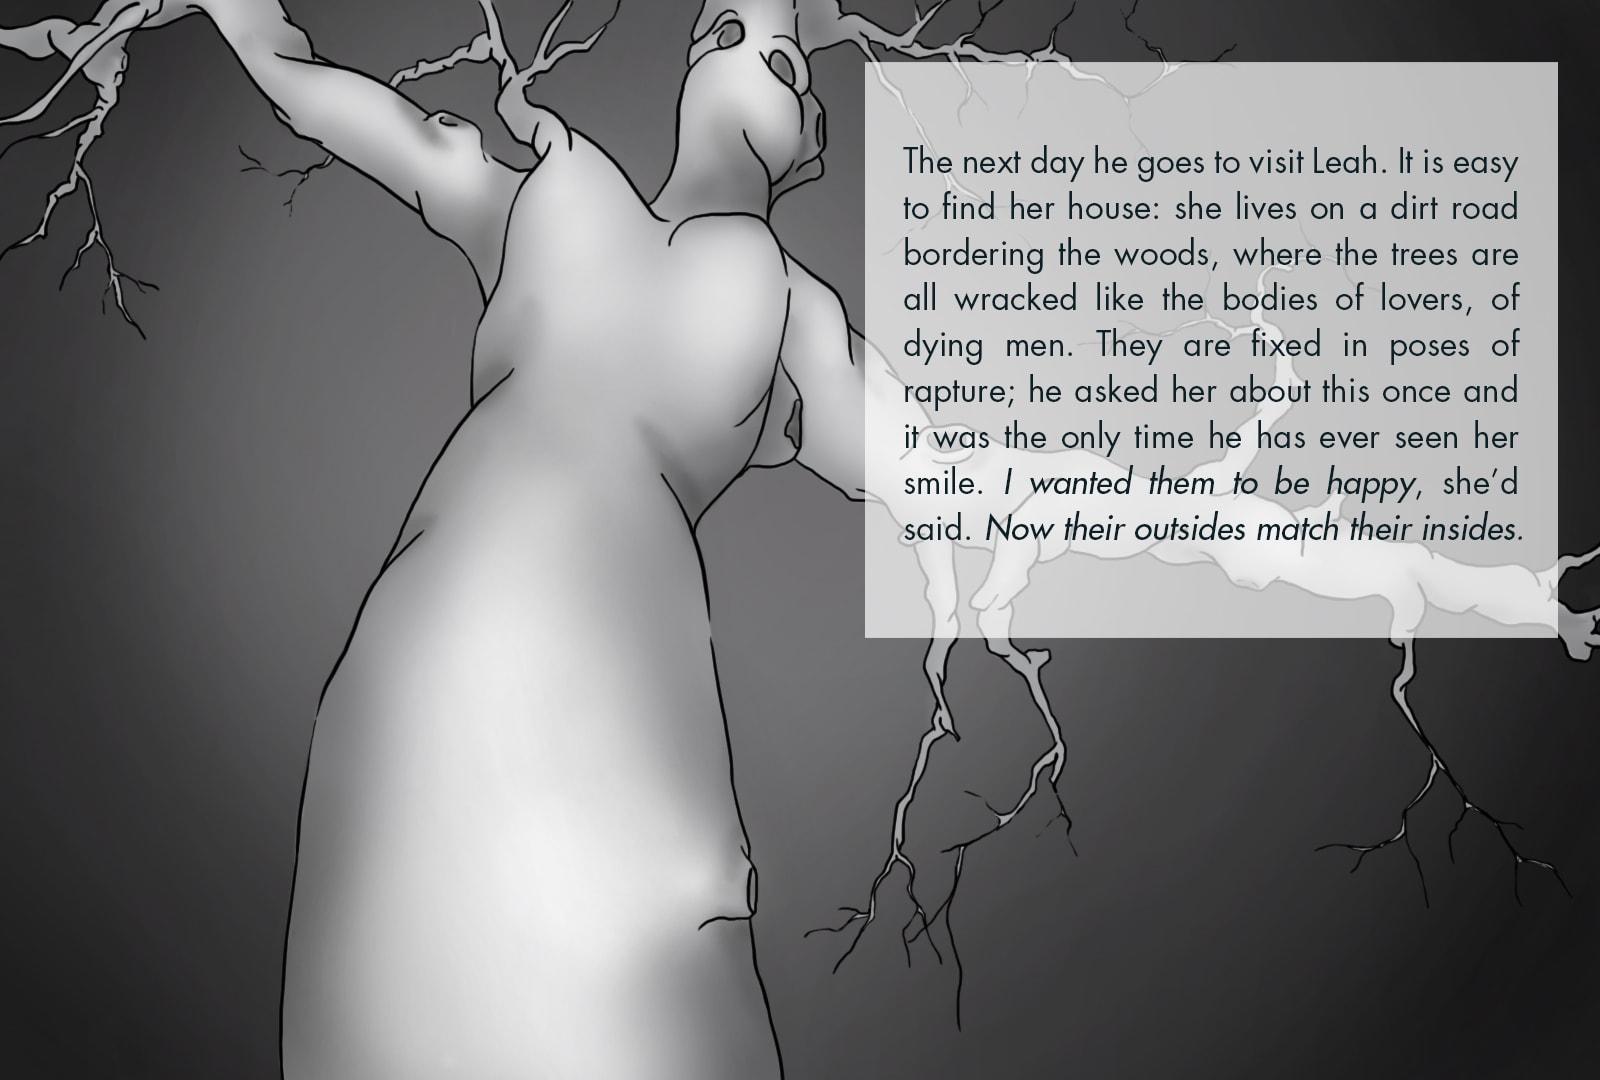 Monthly Fiction Maker illustration illustraded story Seth Marlin Alyssa Cooper page 7